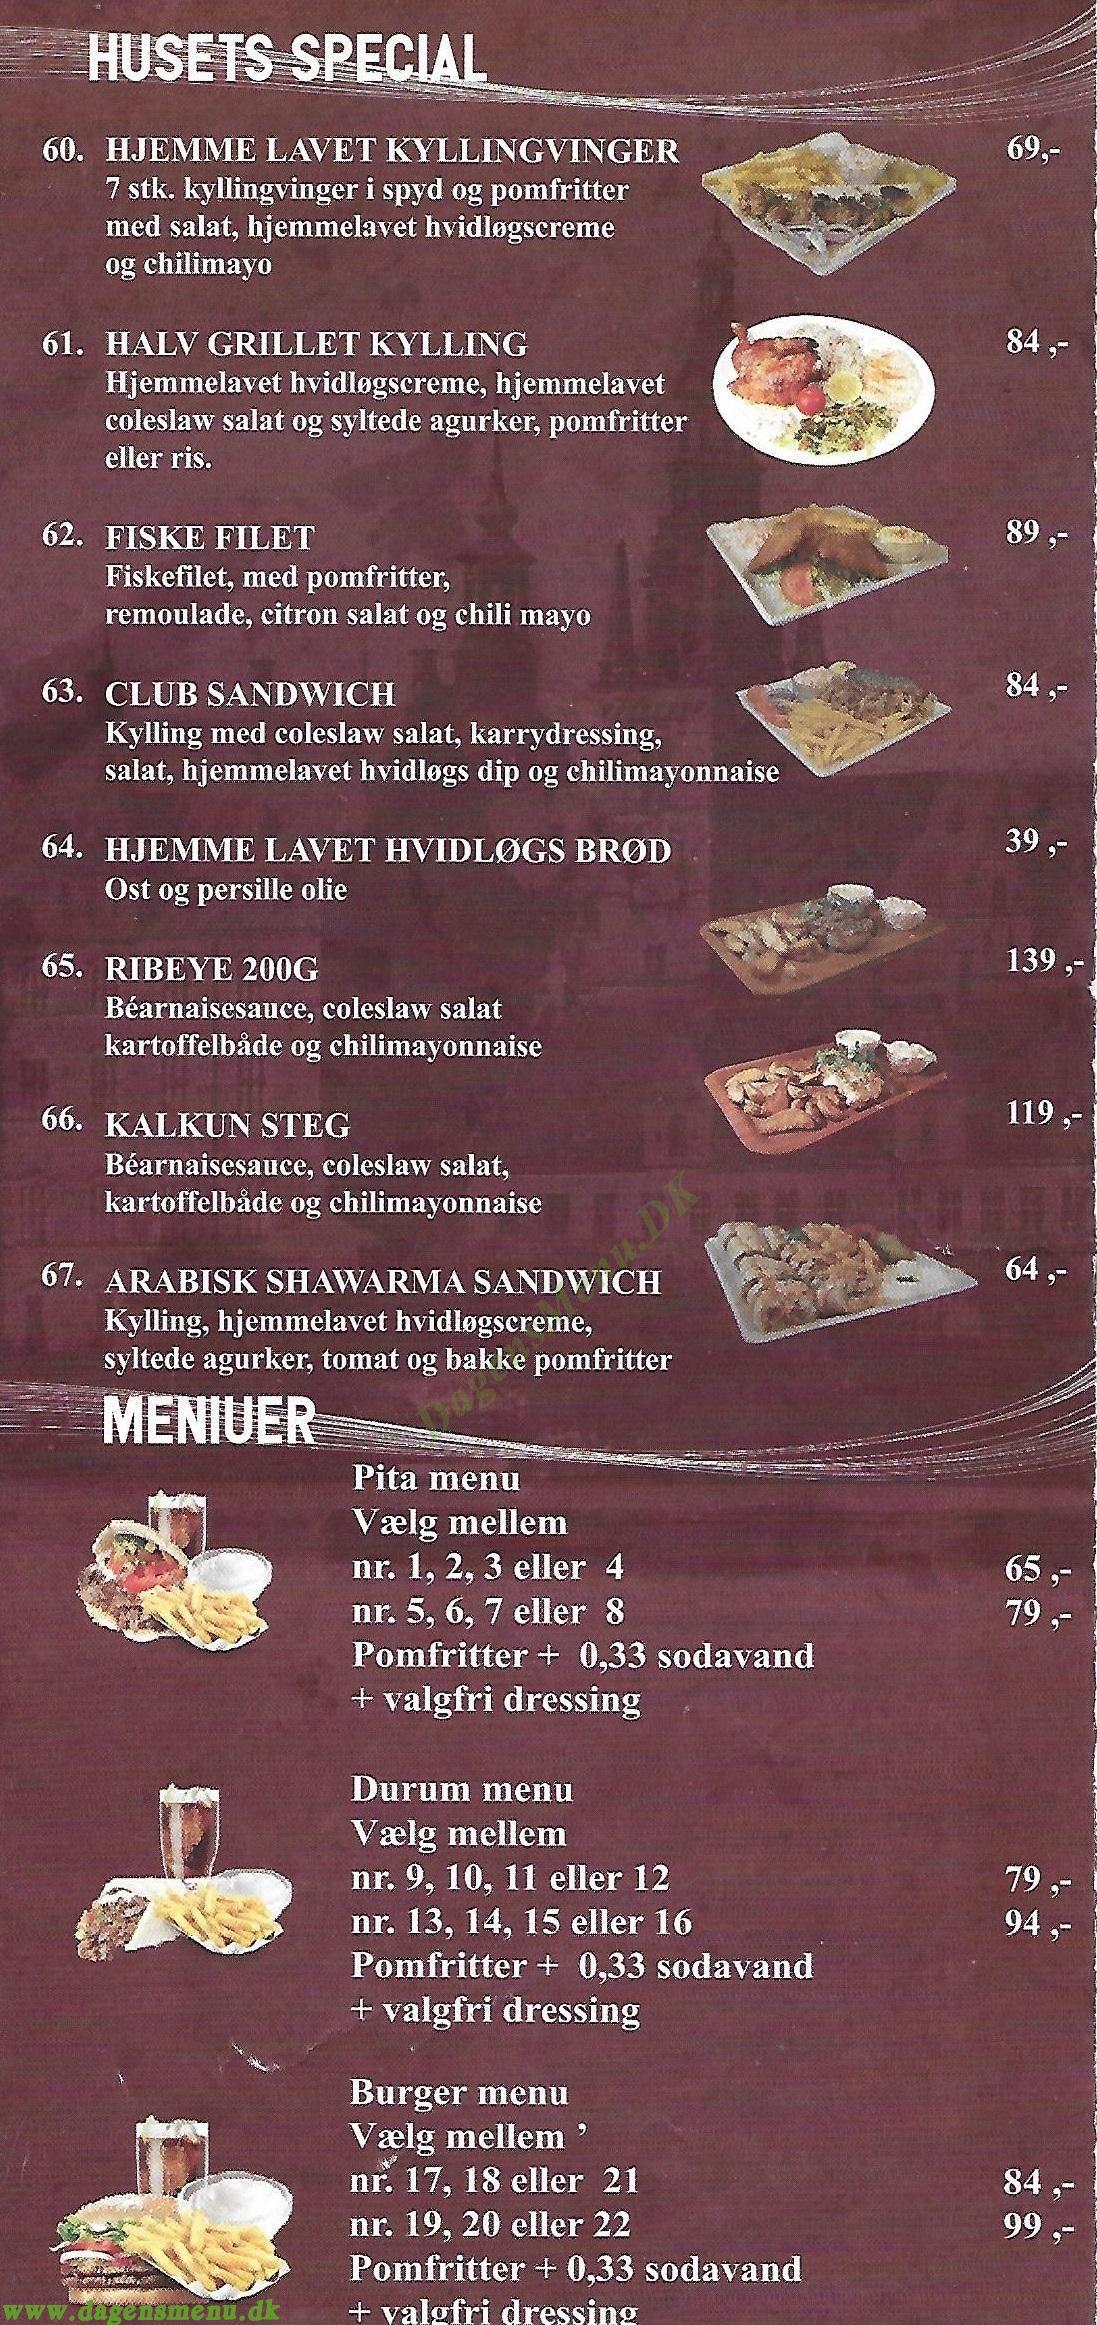 Hillerød Grill House - Menukort